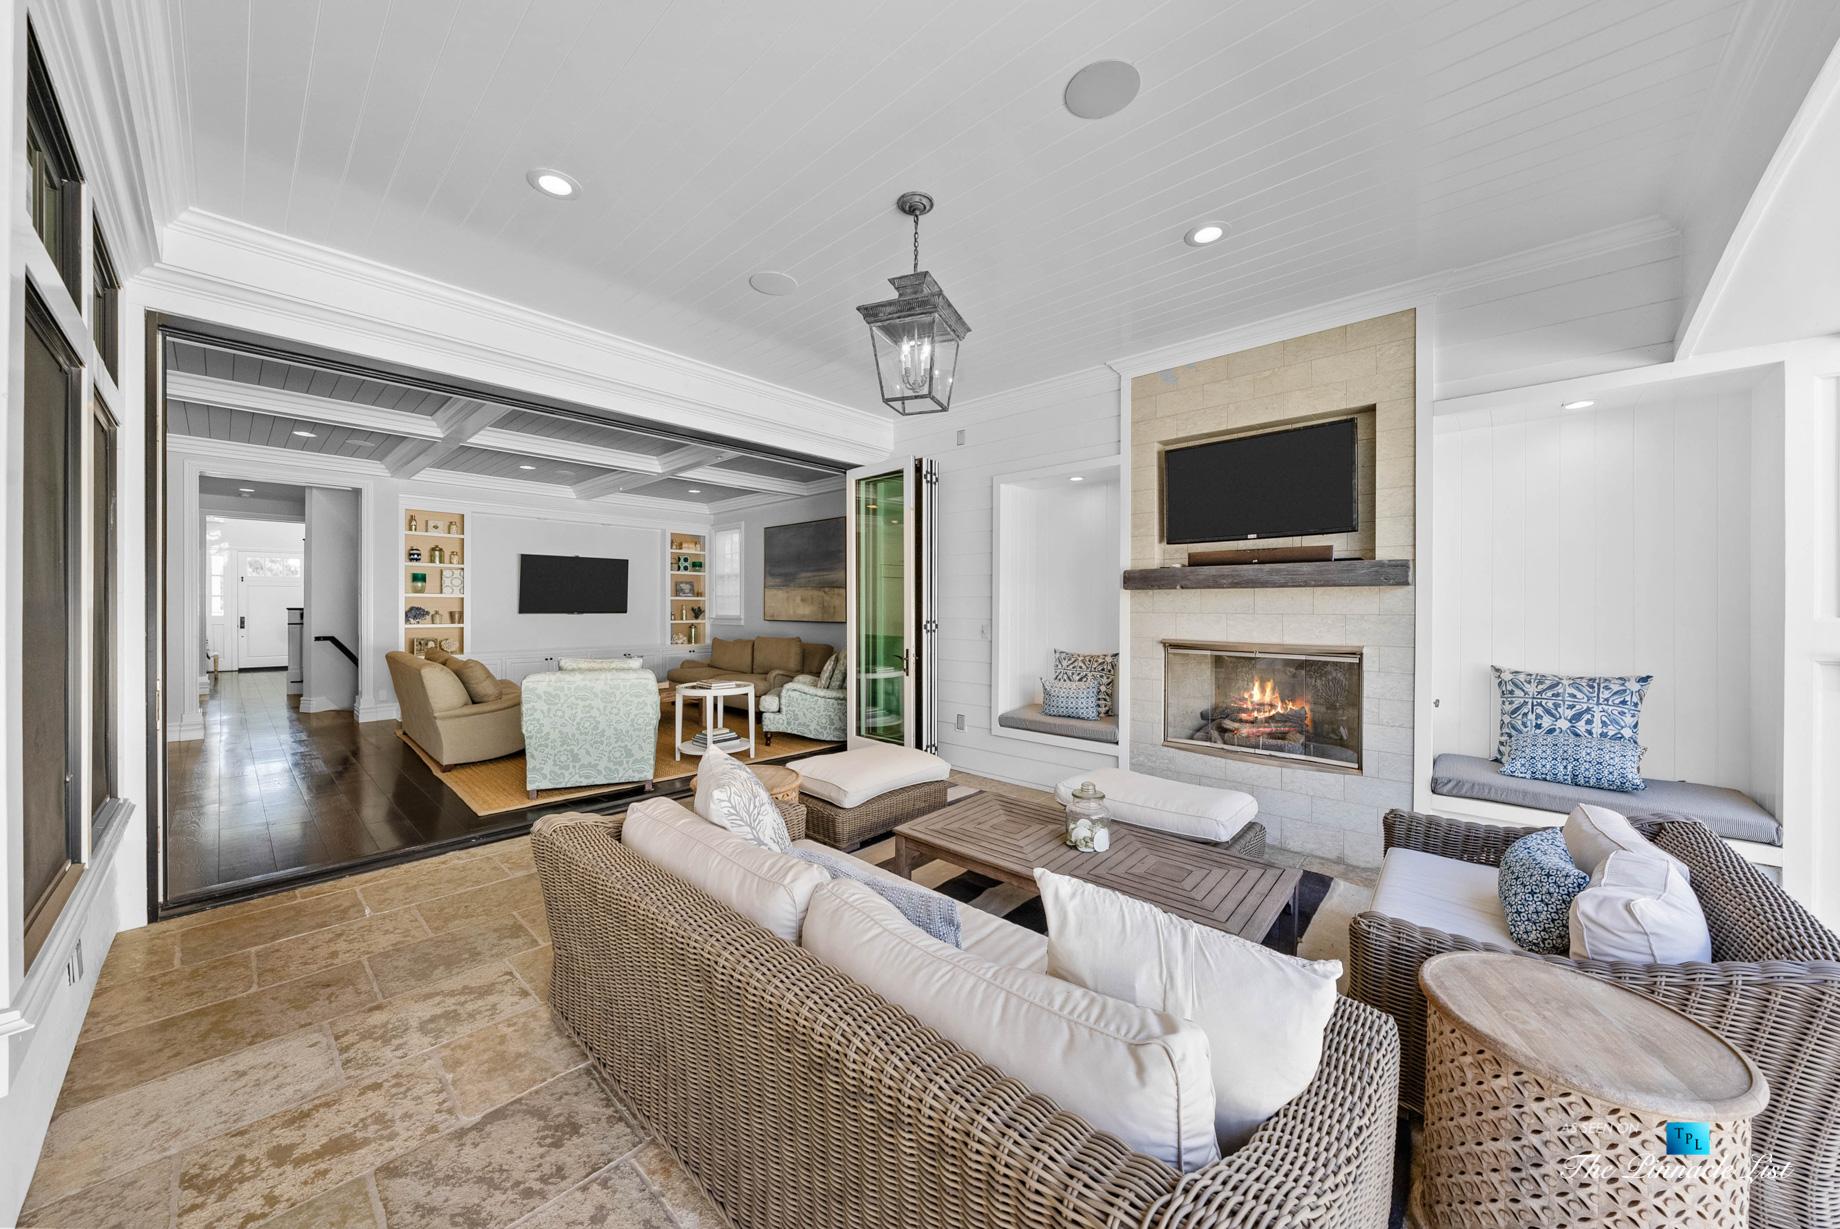 1412 Laurel Ave, Manhattan Beach, CA, USA – Backyard Lounge and Living Room